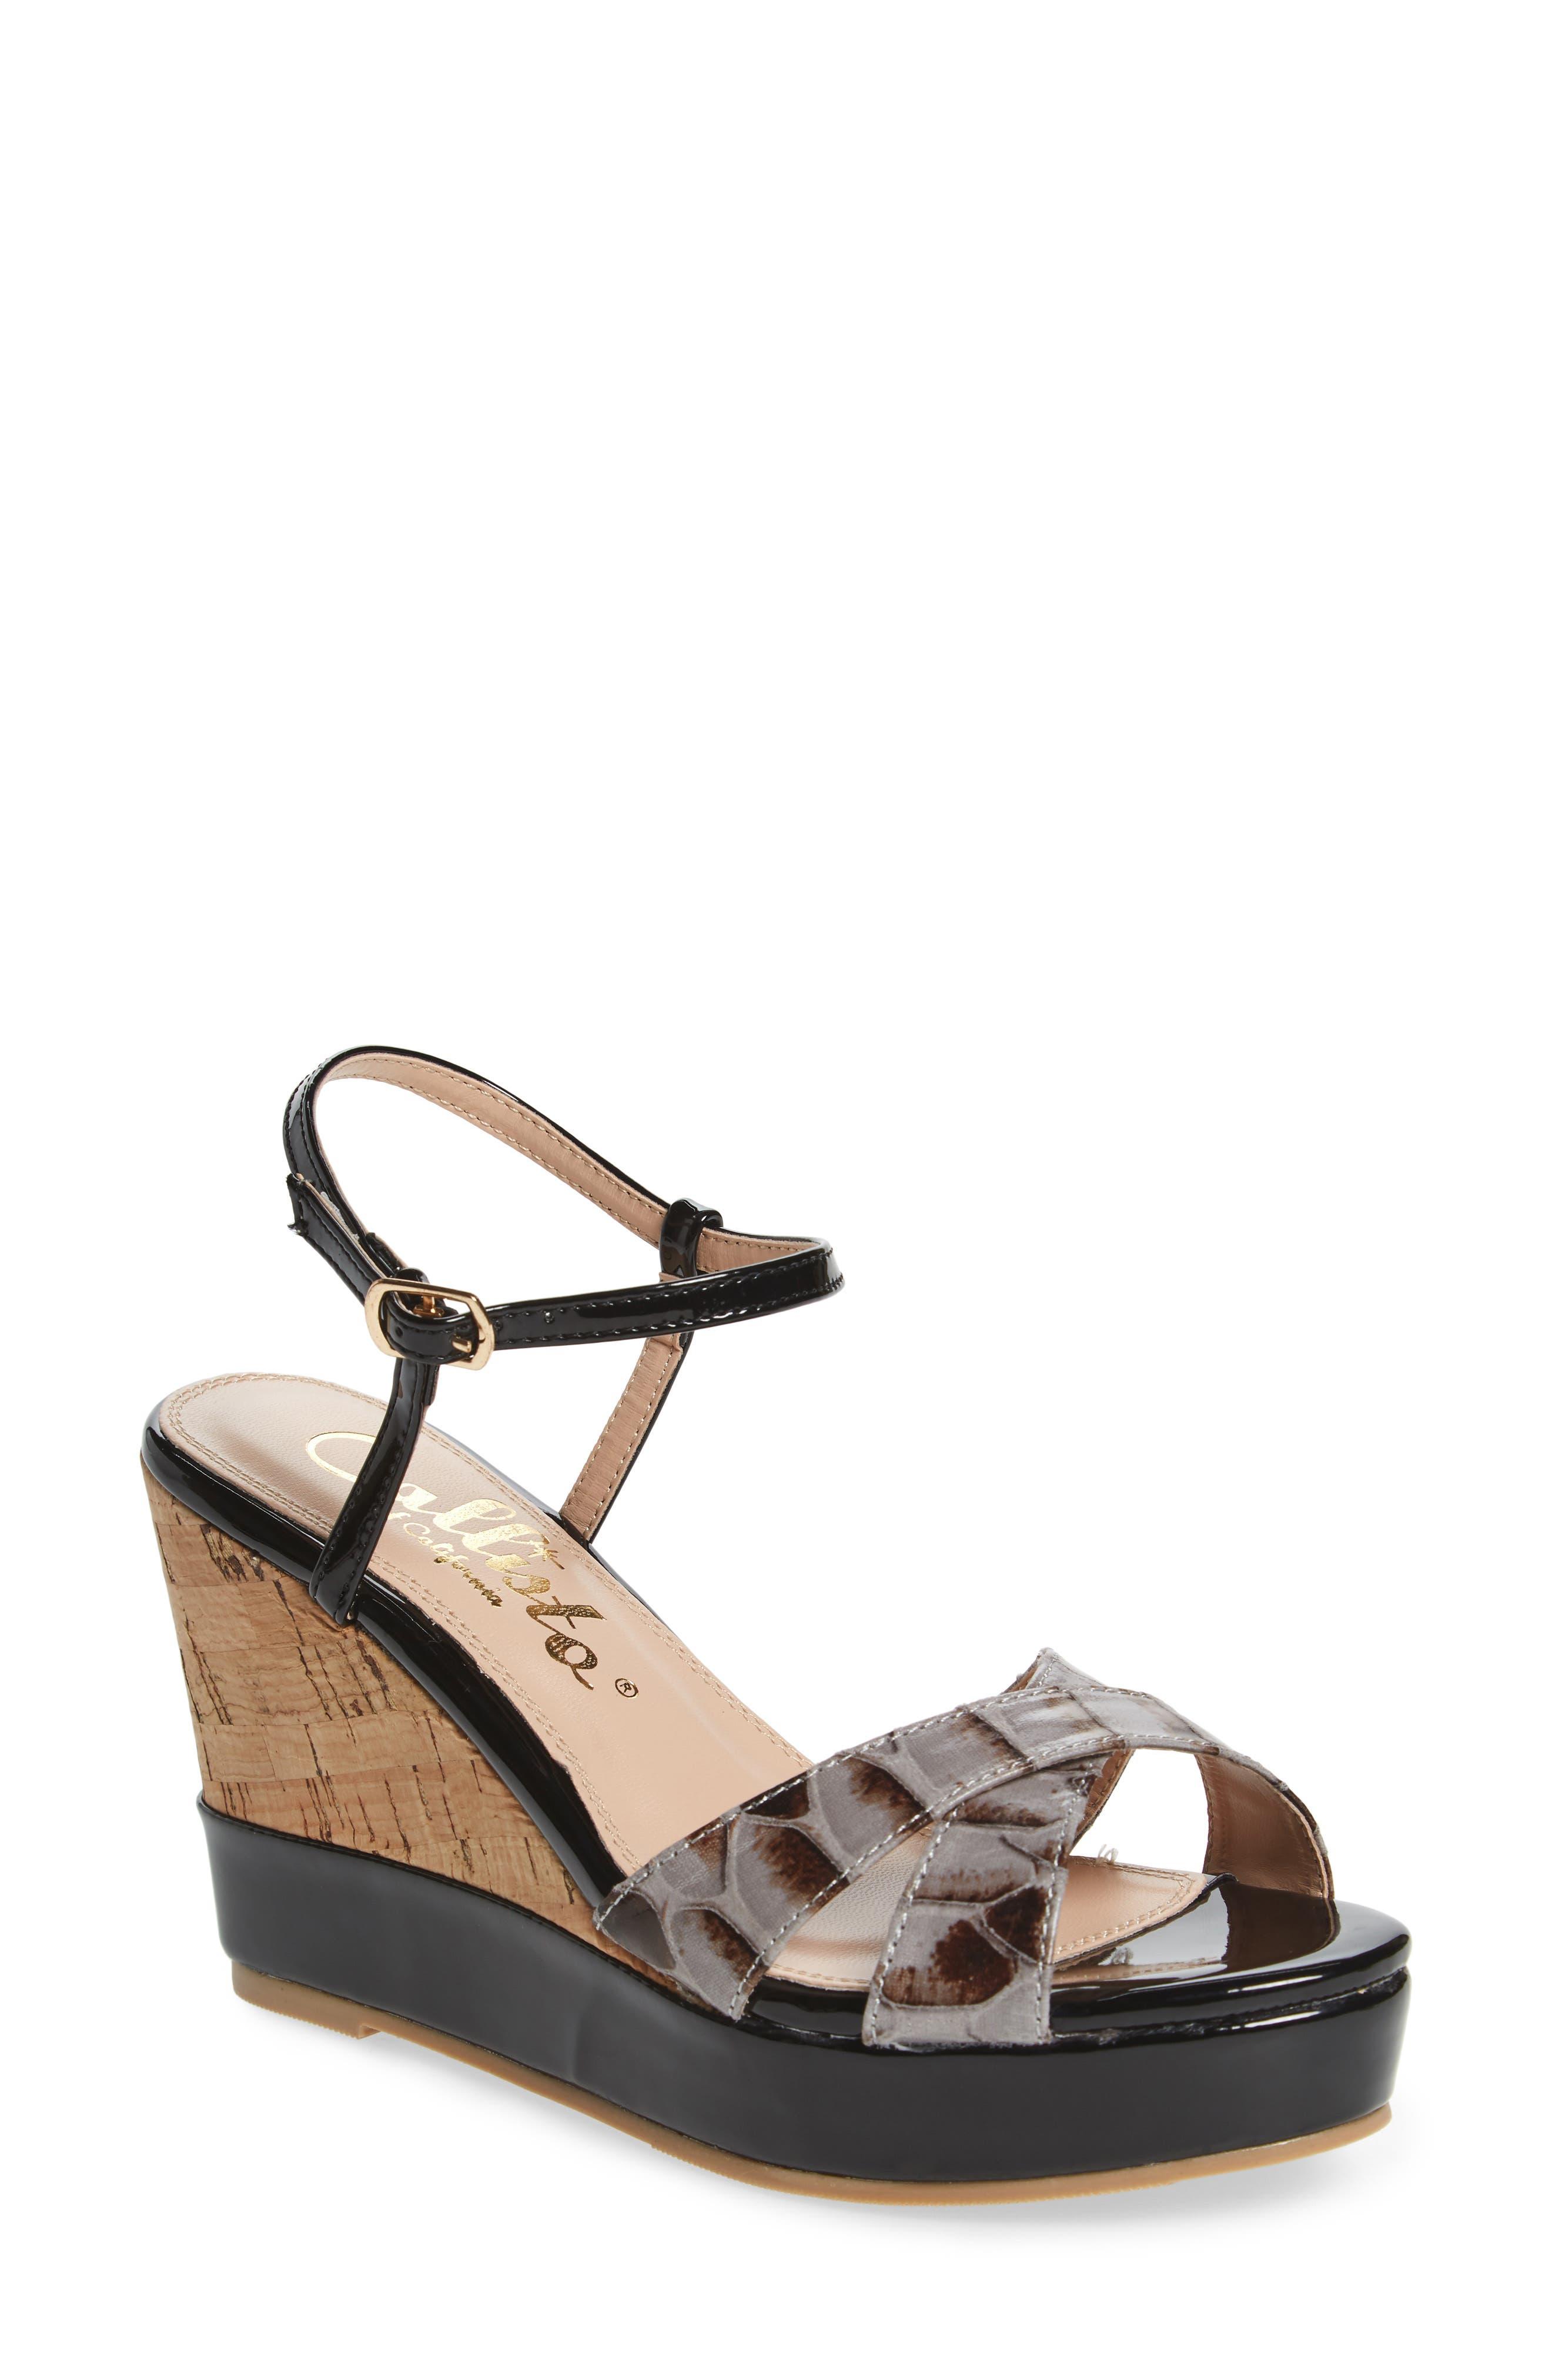 Lottie Platform Wedge Sandal,                         Main,                         color, 001